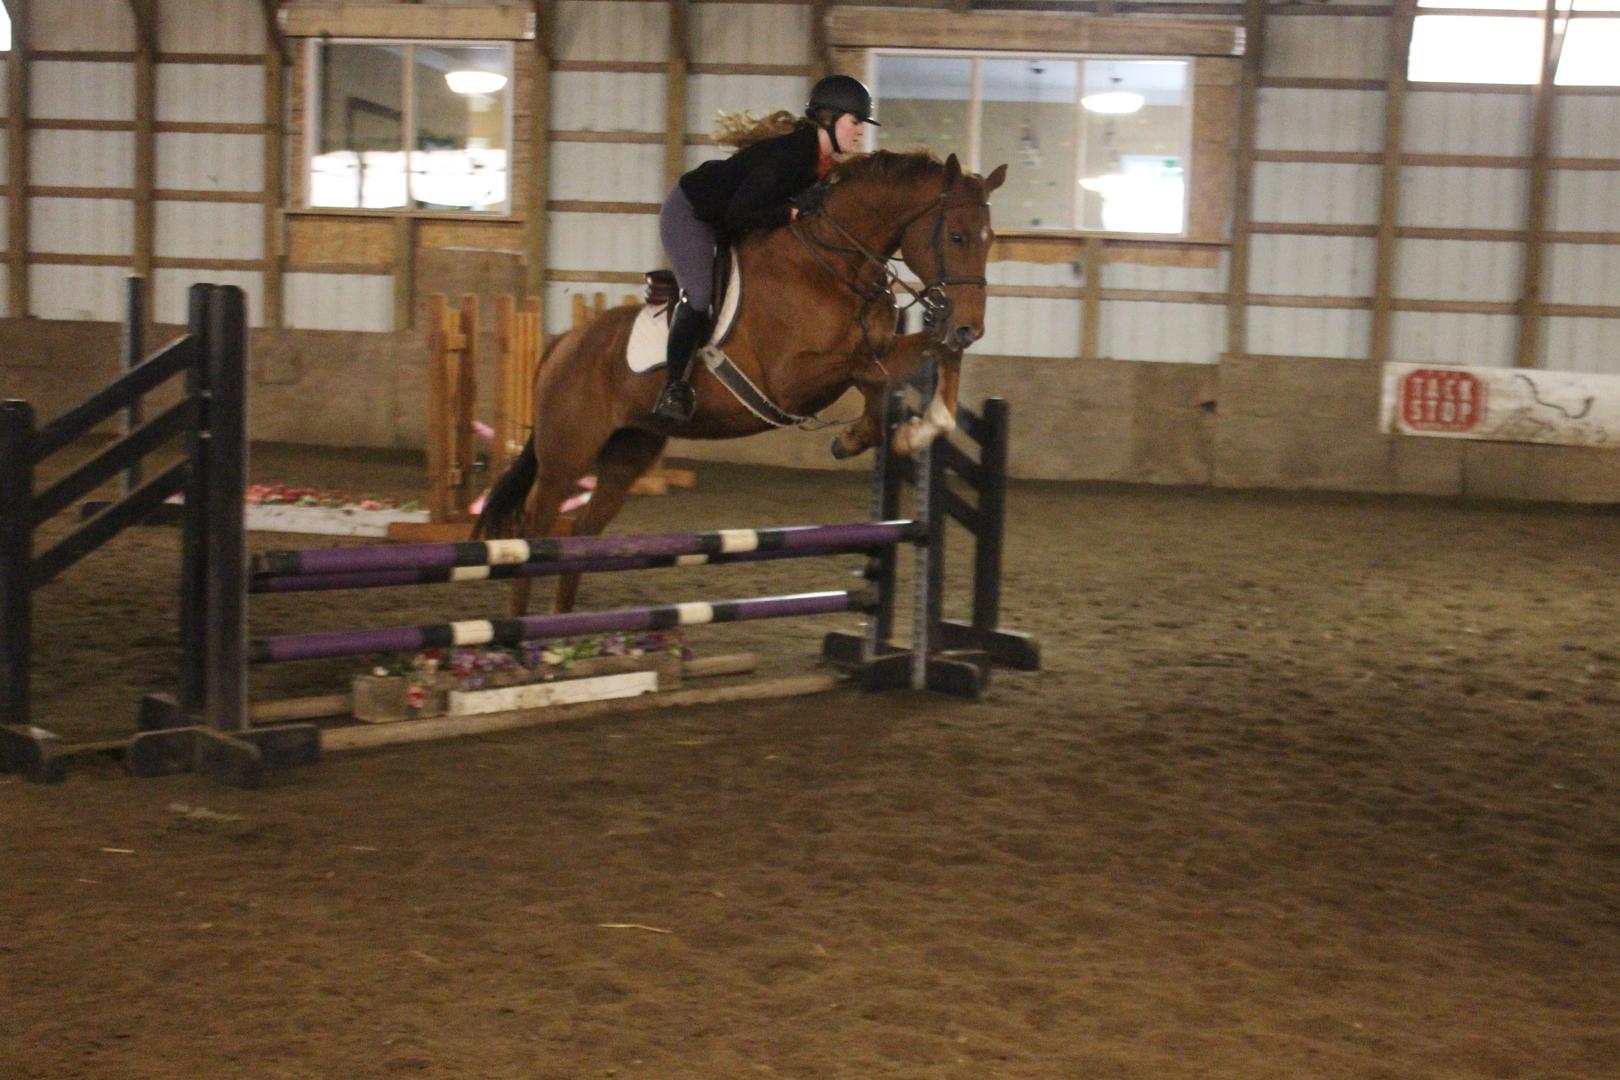 Michigan oakland county highland - Horse Riding Lesson Horse Training Blackstone Stables Highland Township Mi